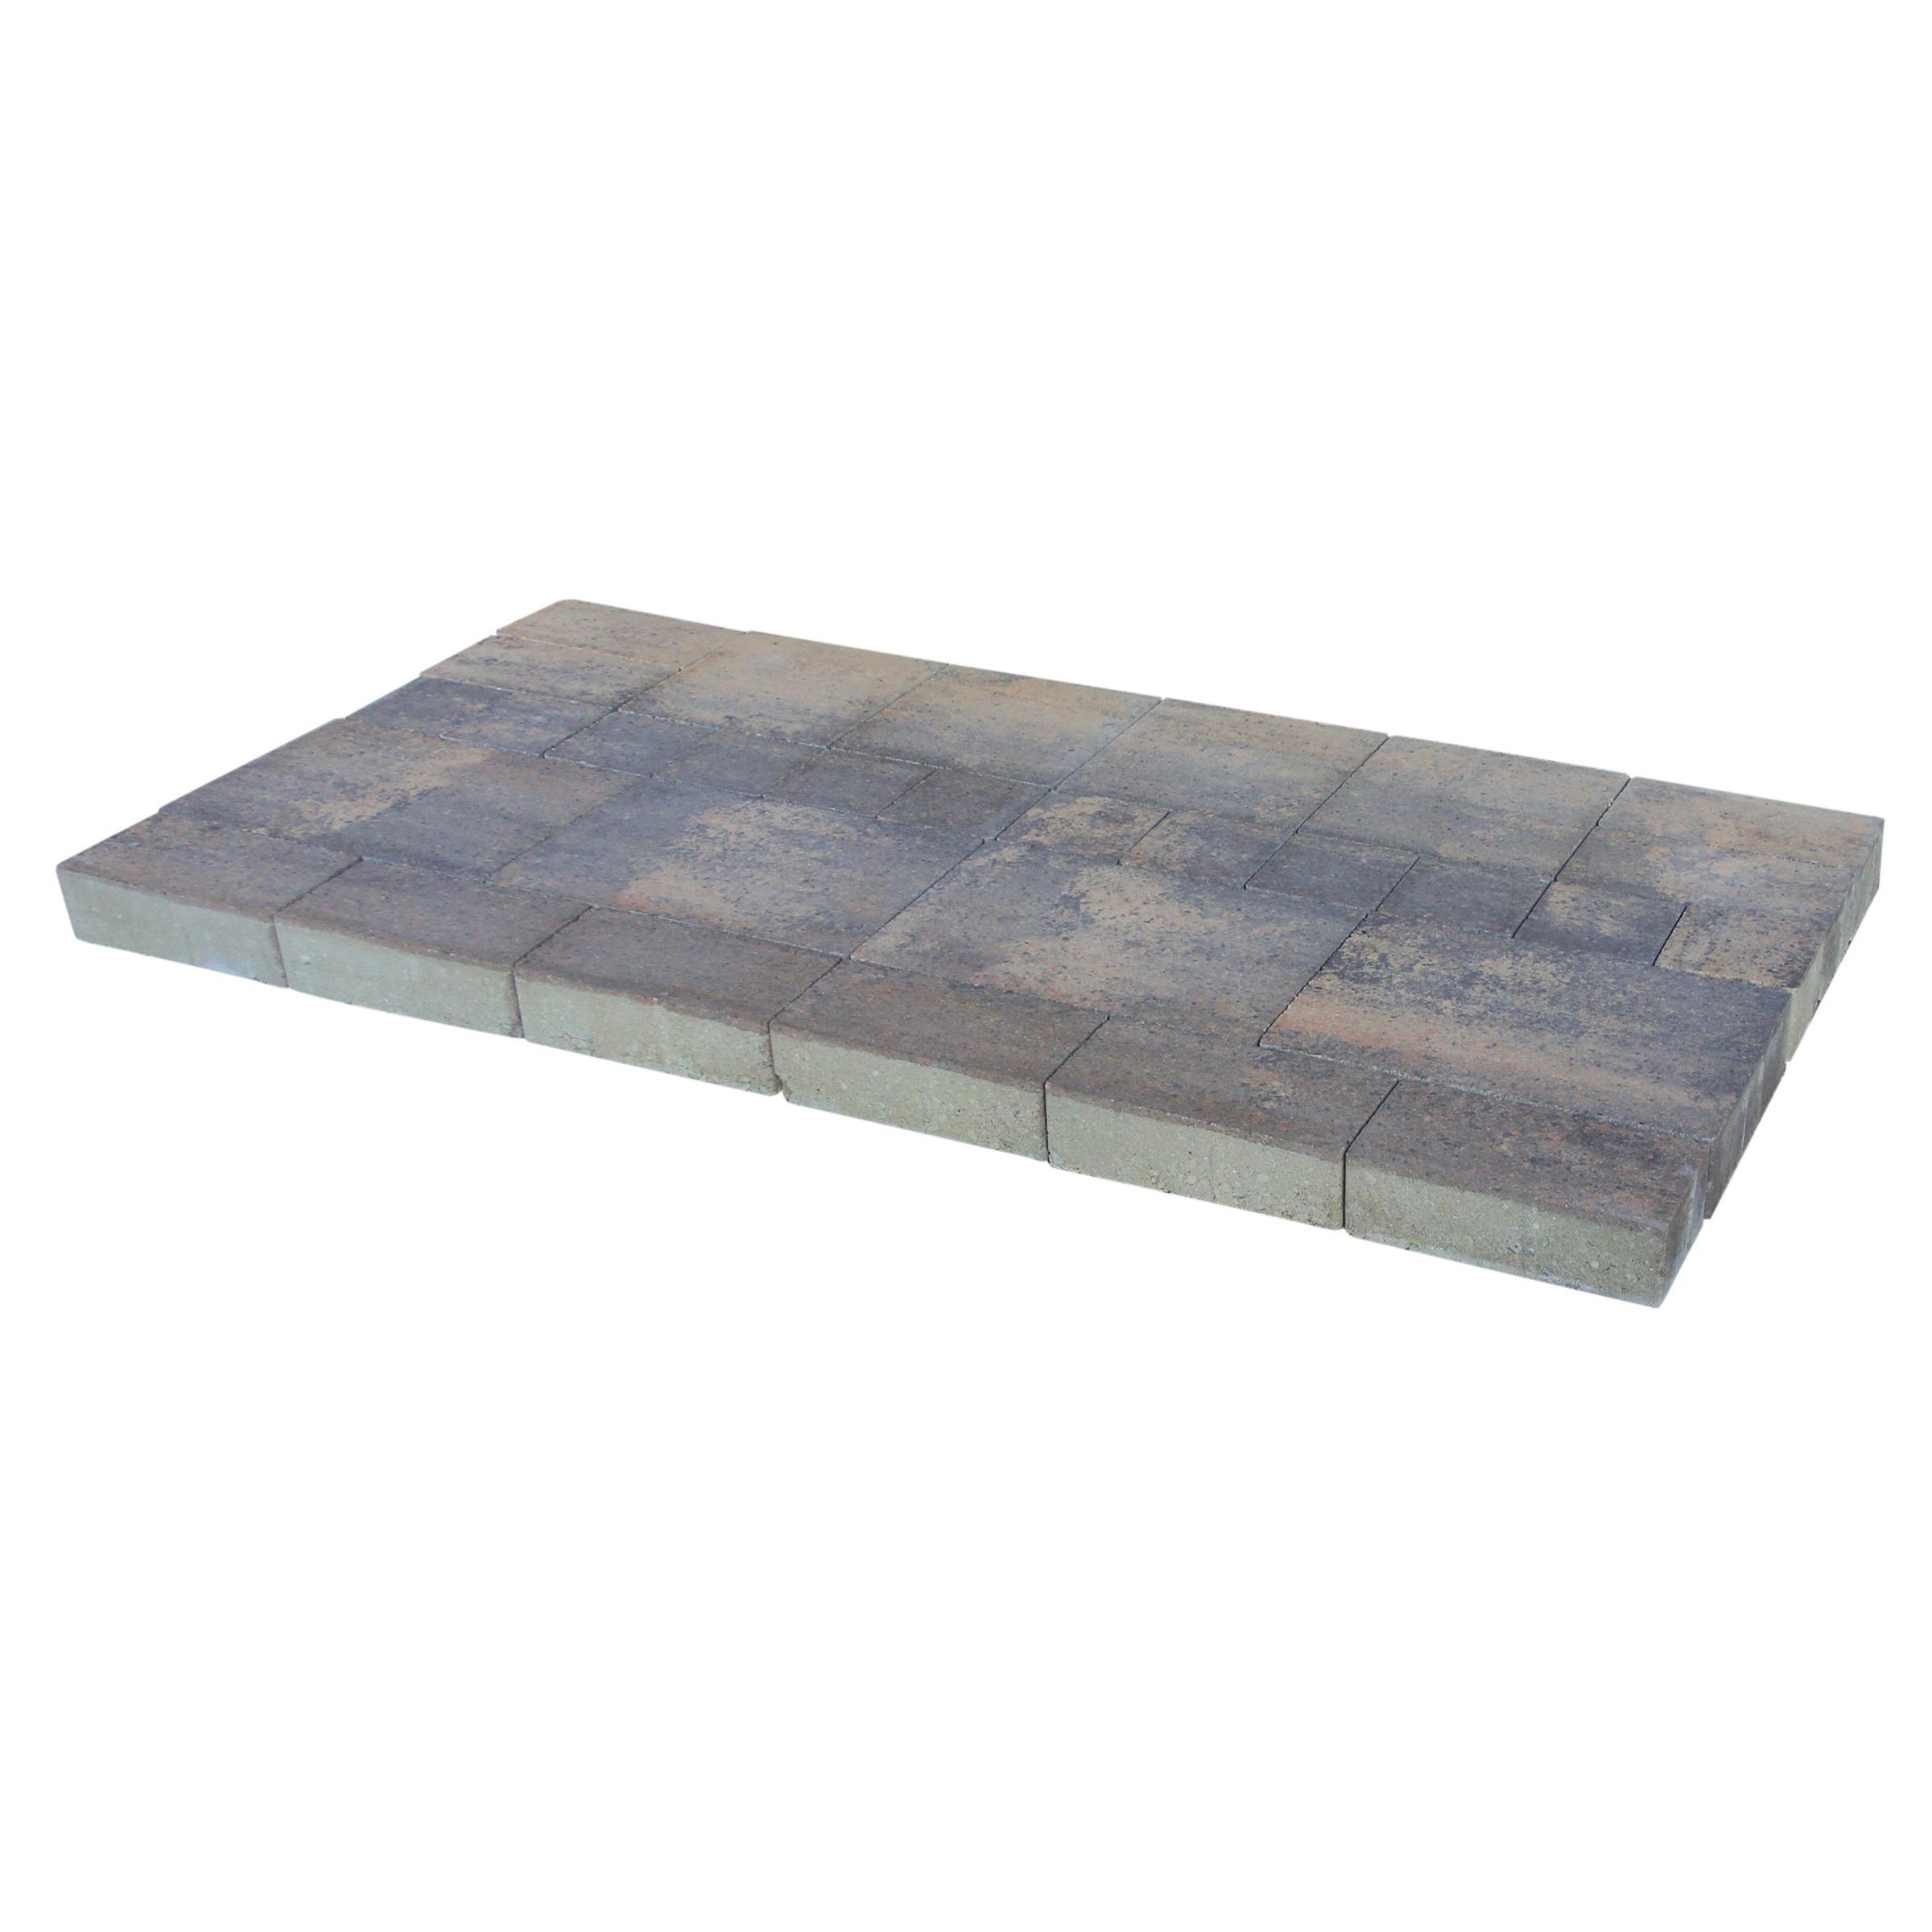 Kasseien Beton Plano Taunus Wildverband Grijs/Bruin - 0,72 m2